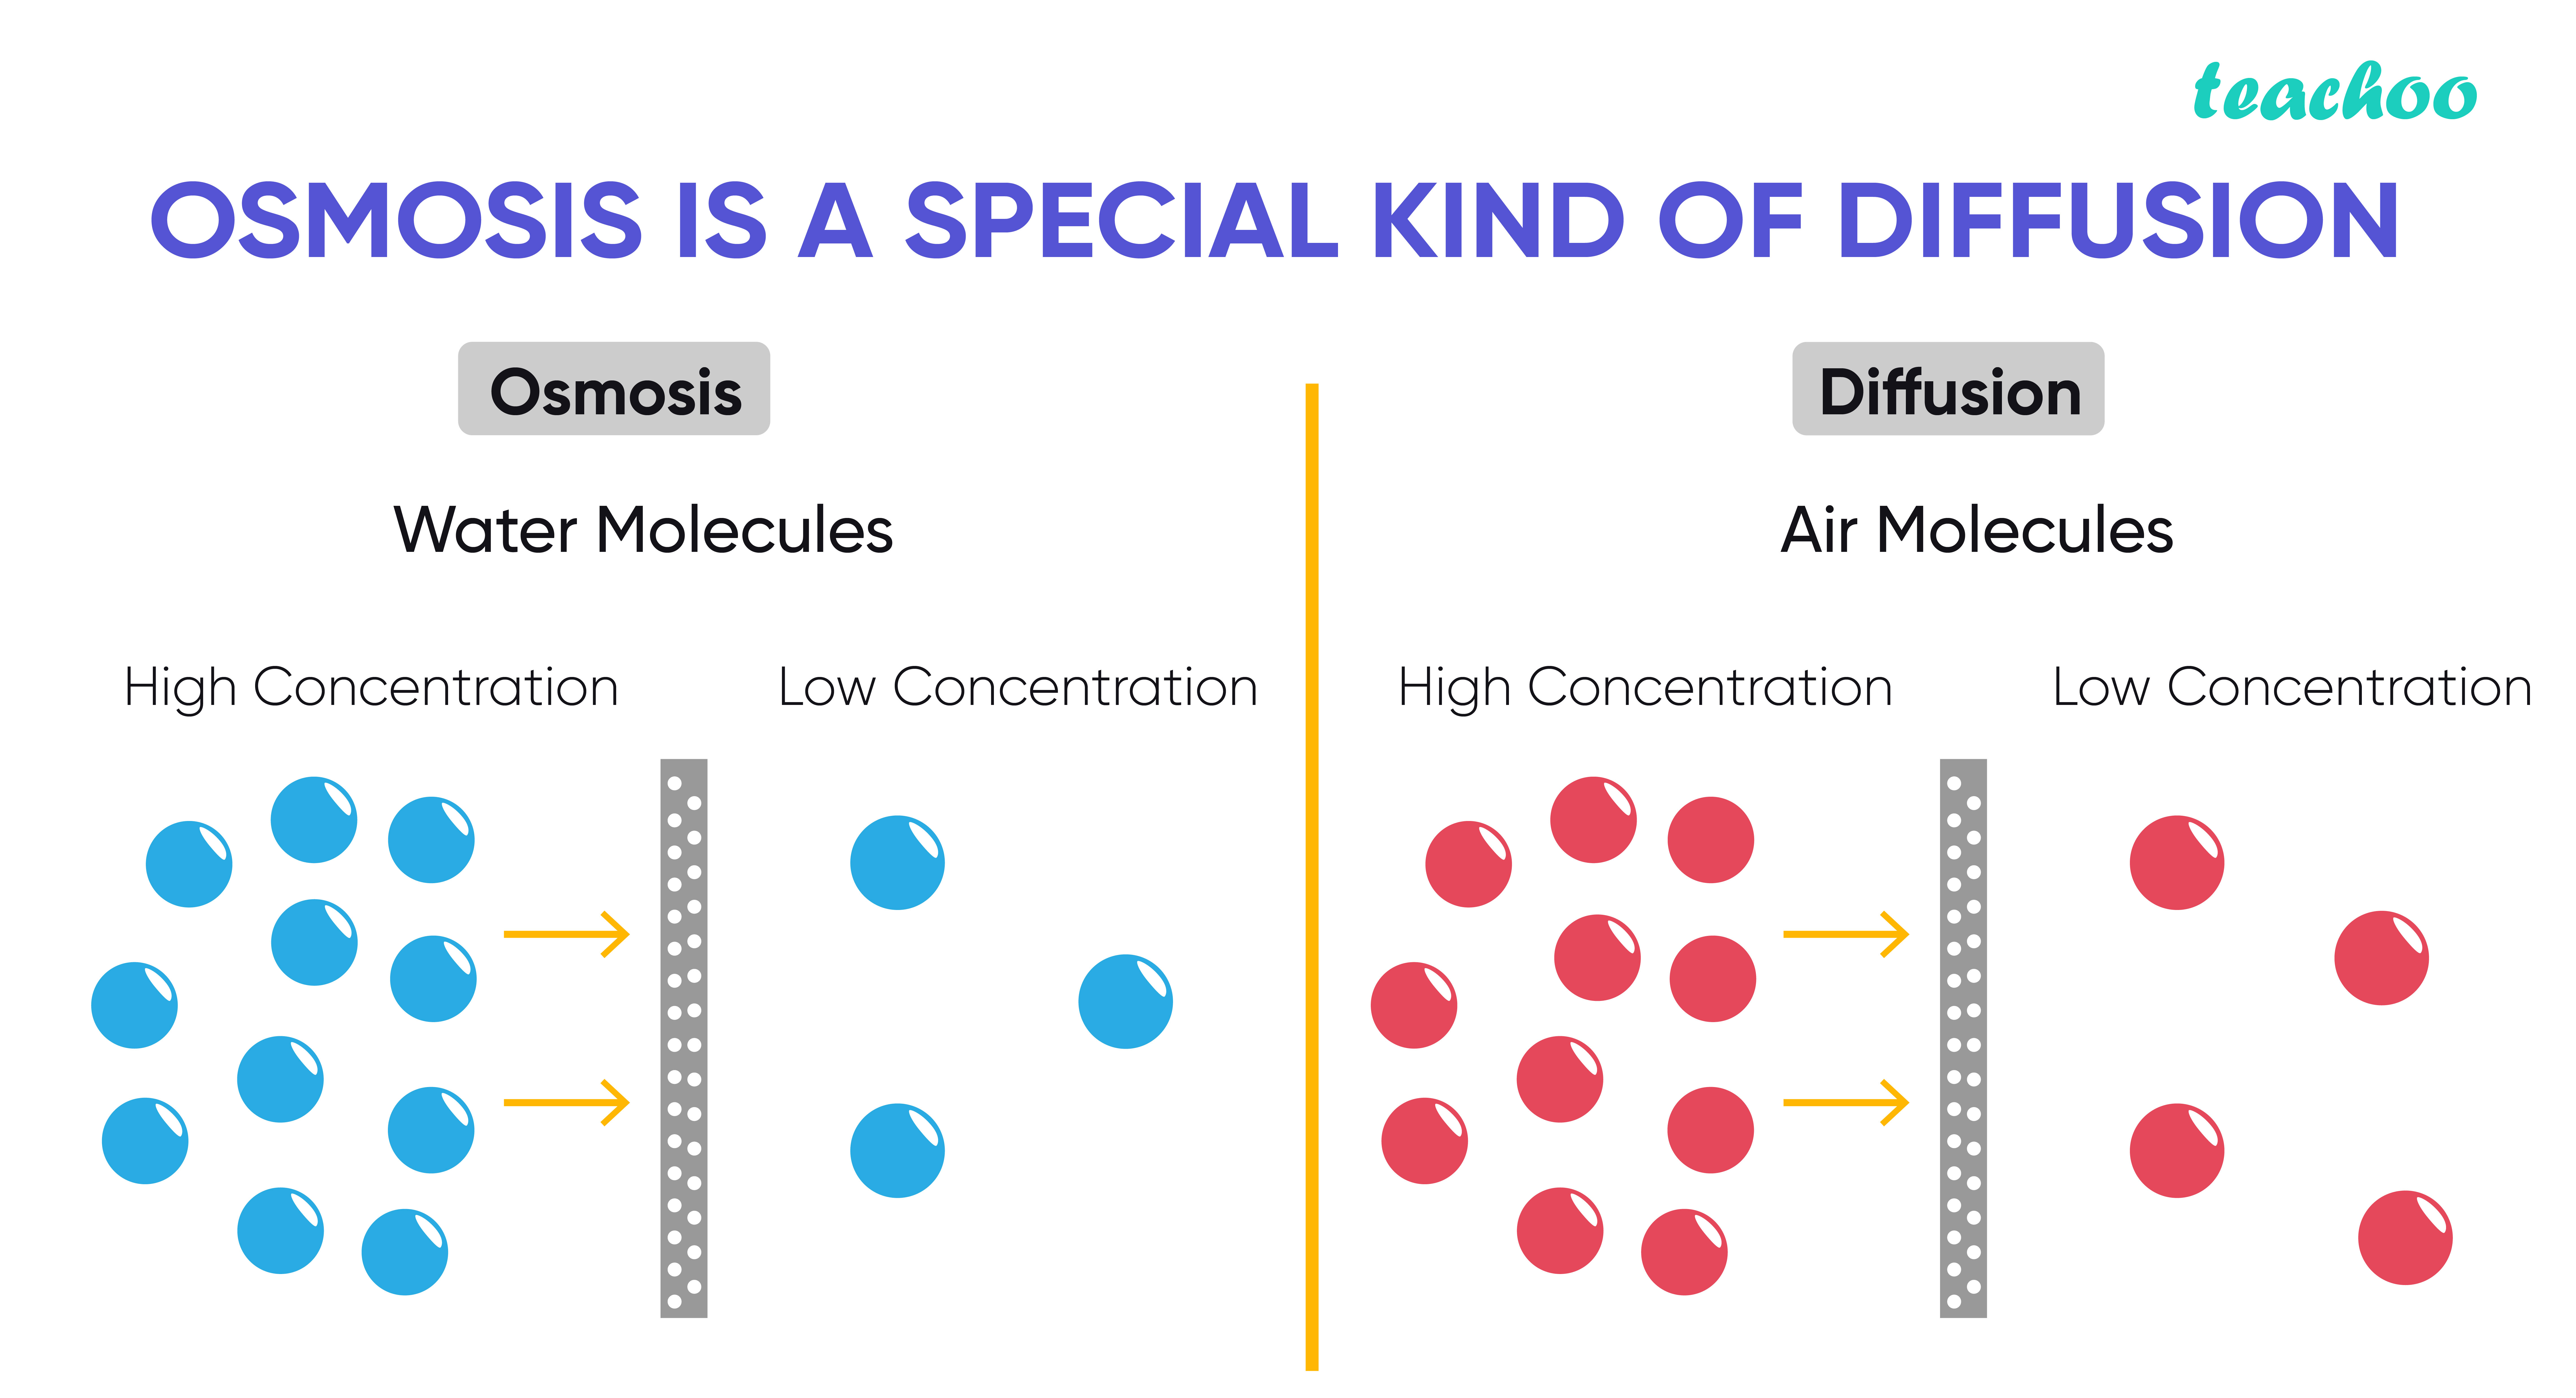 Osmosis is a special kind of diffusion-Teachoo-01.jpg